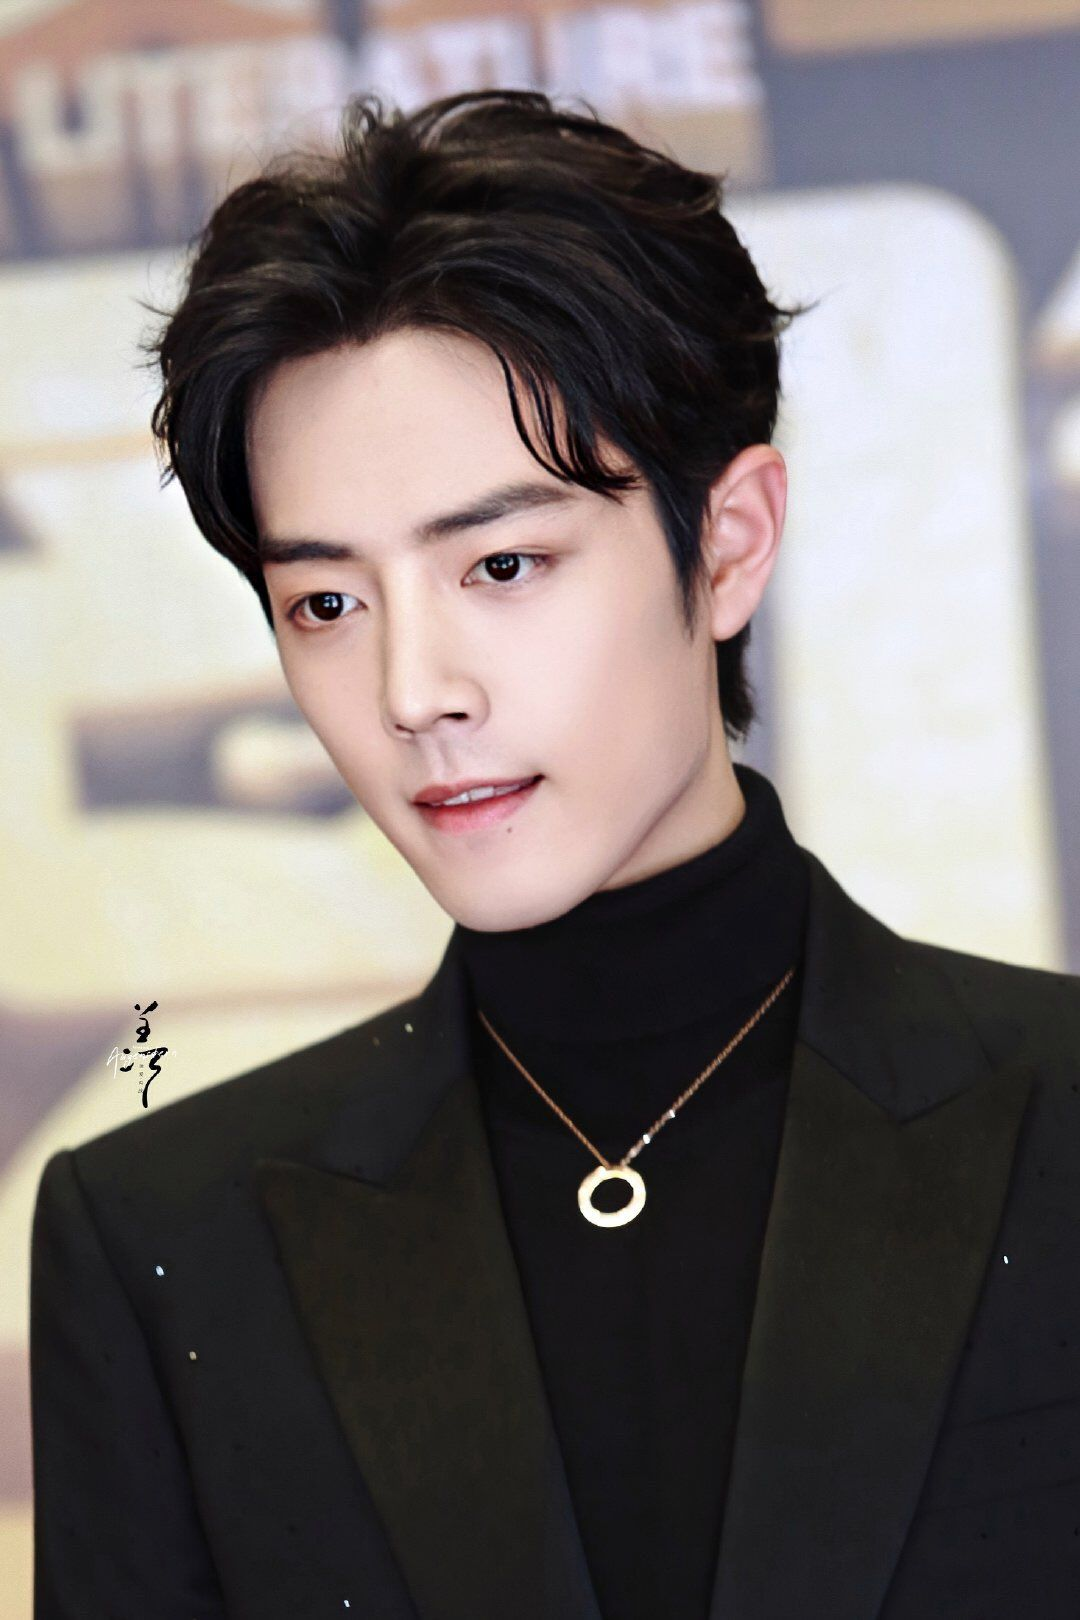 BoJunYiXiao_TH🦁🐱 on ในปี 2020 นักแสดง